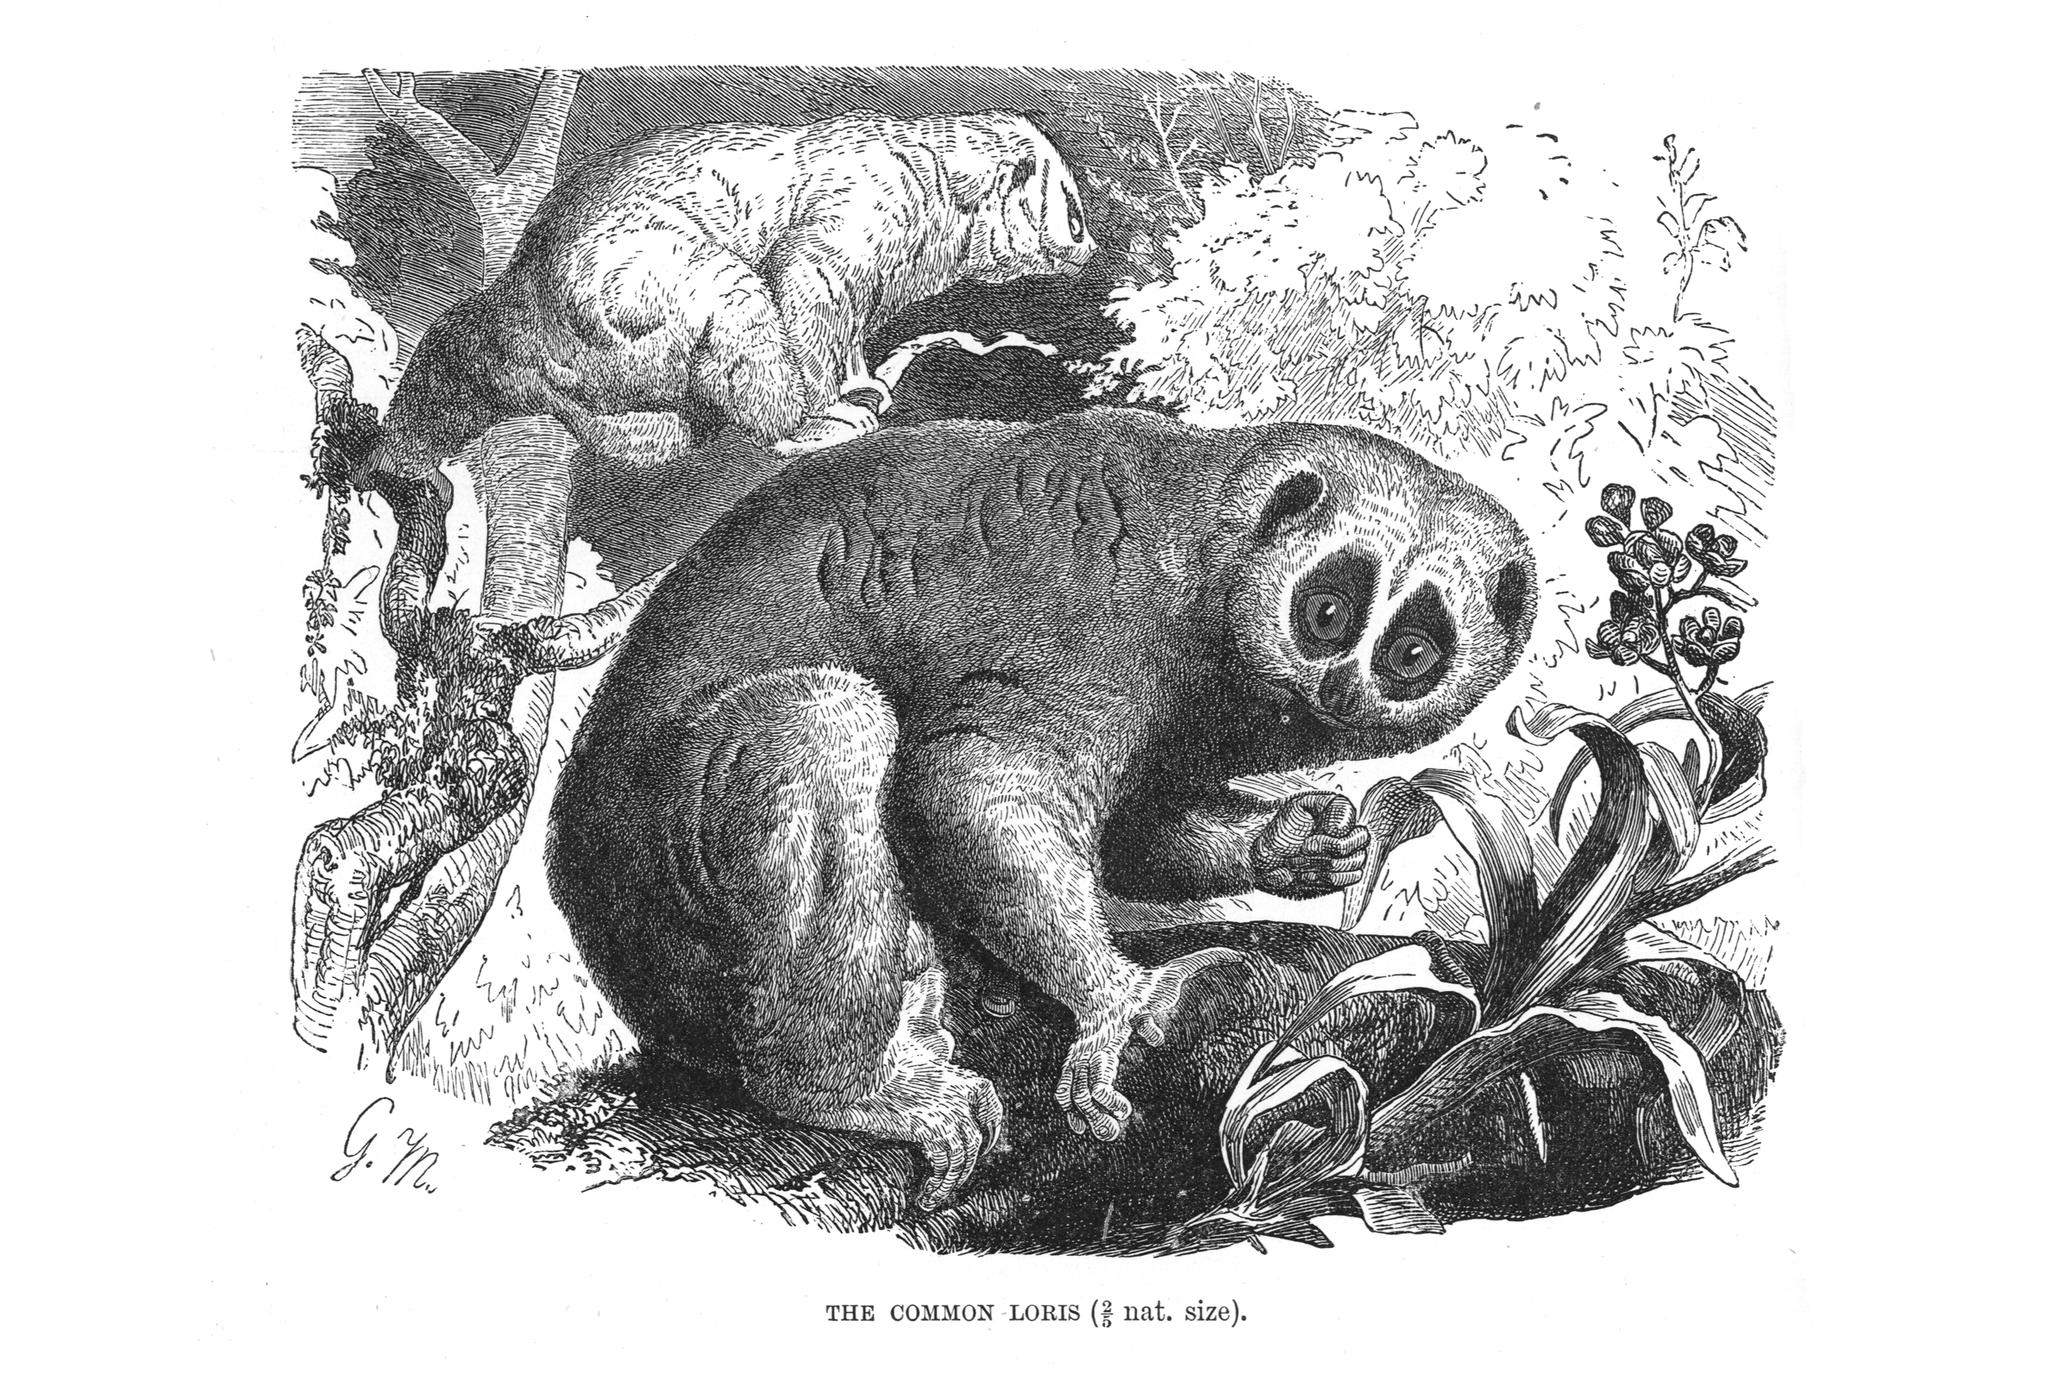 The Common Loris (2/5 nat. size)